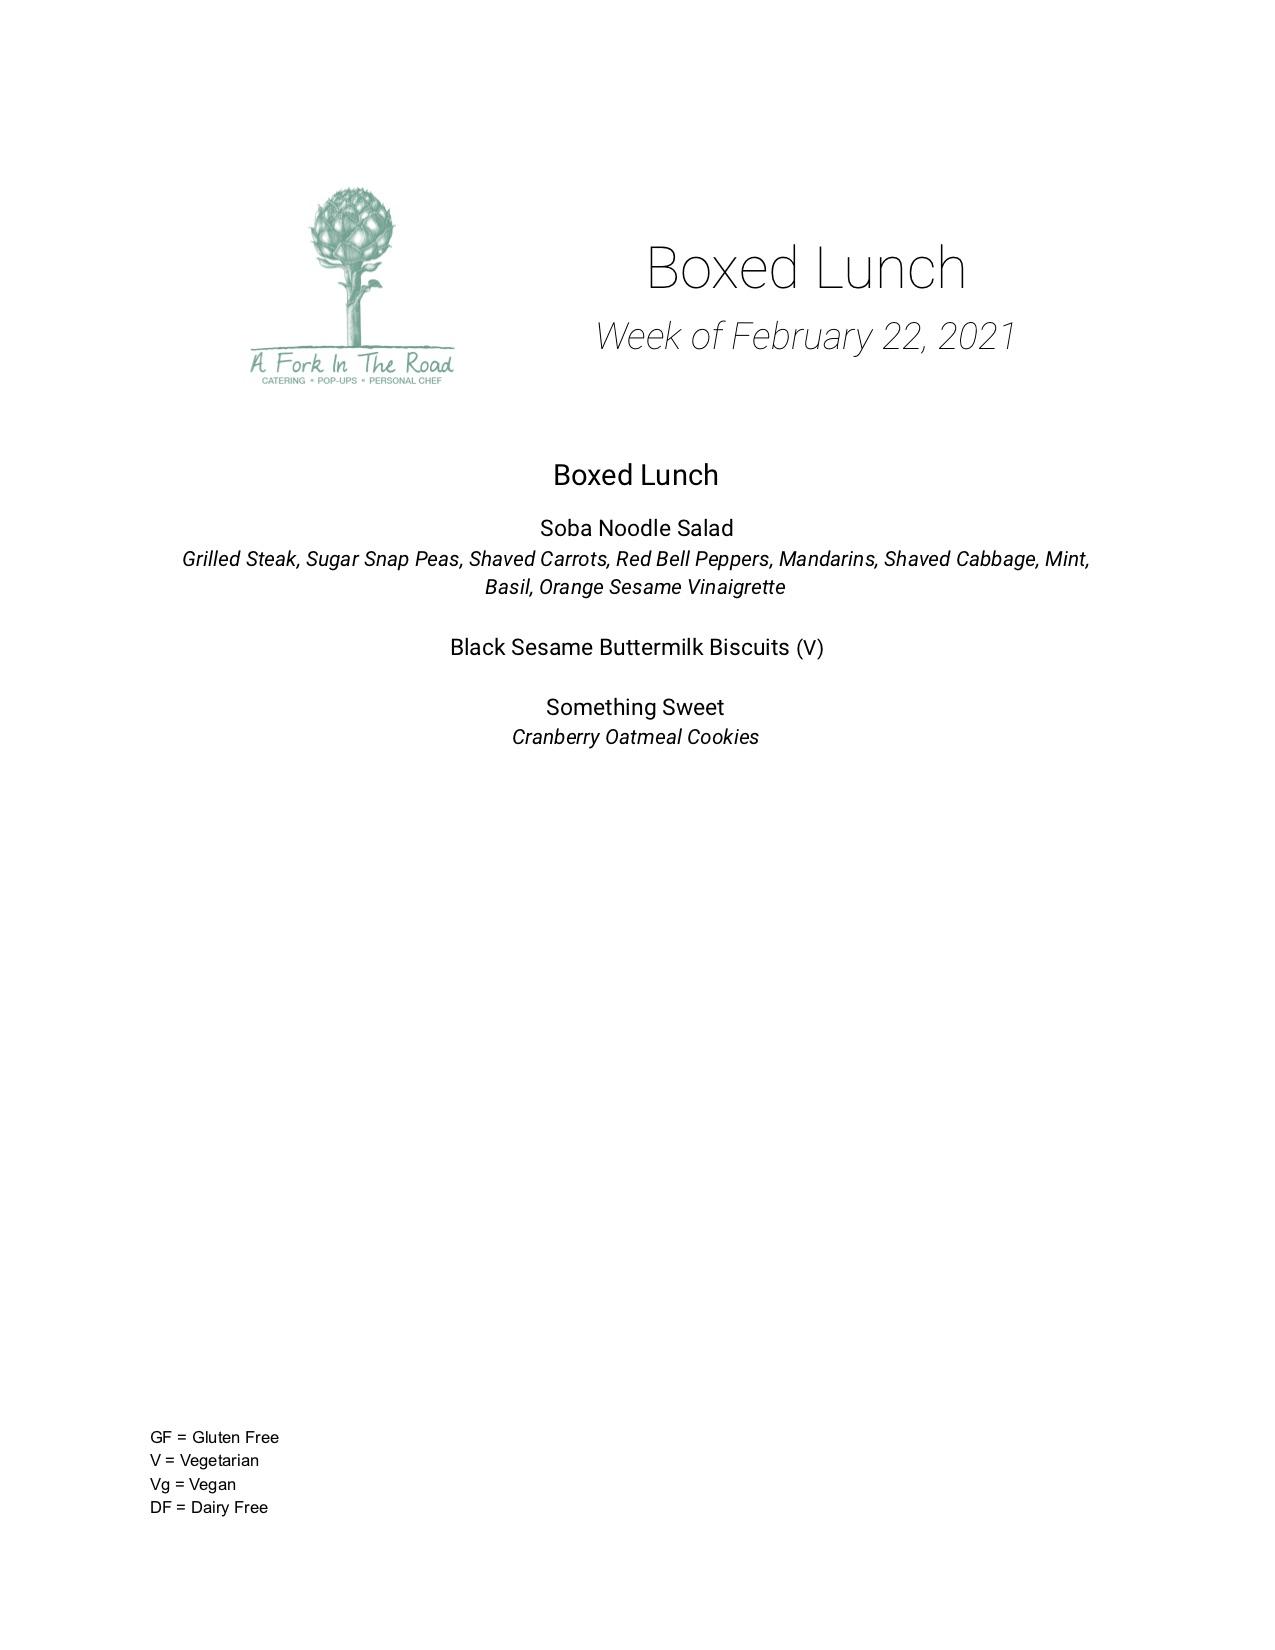 Lunch Week of 2_22